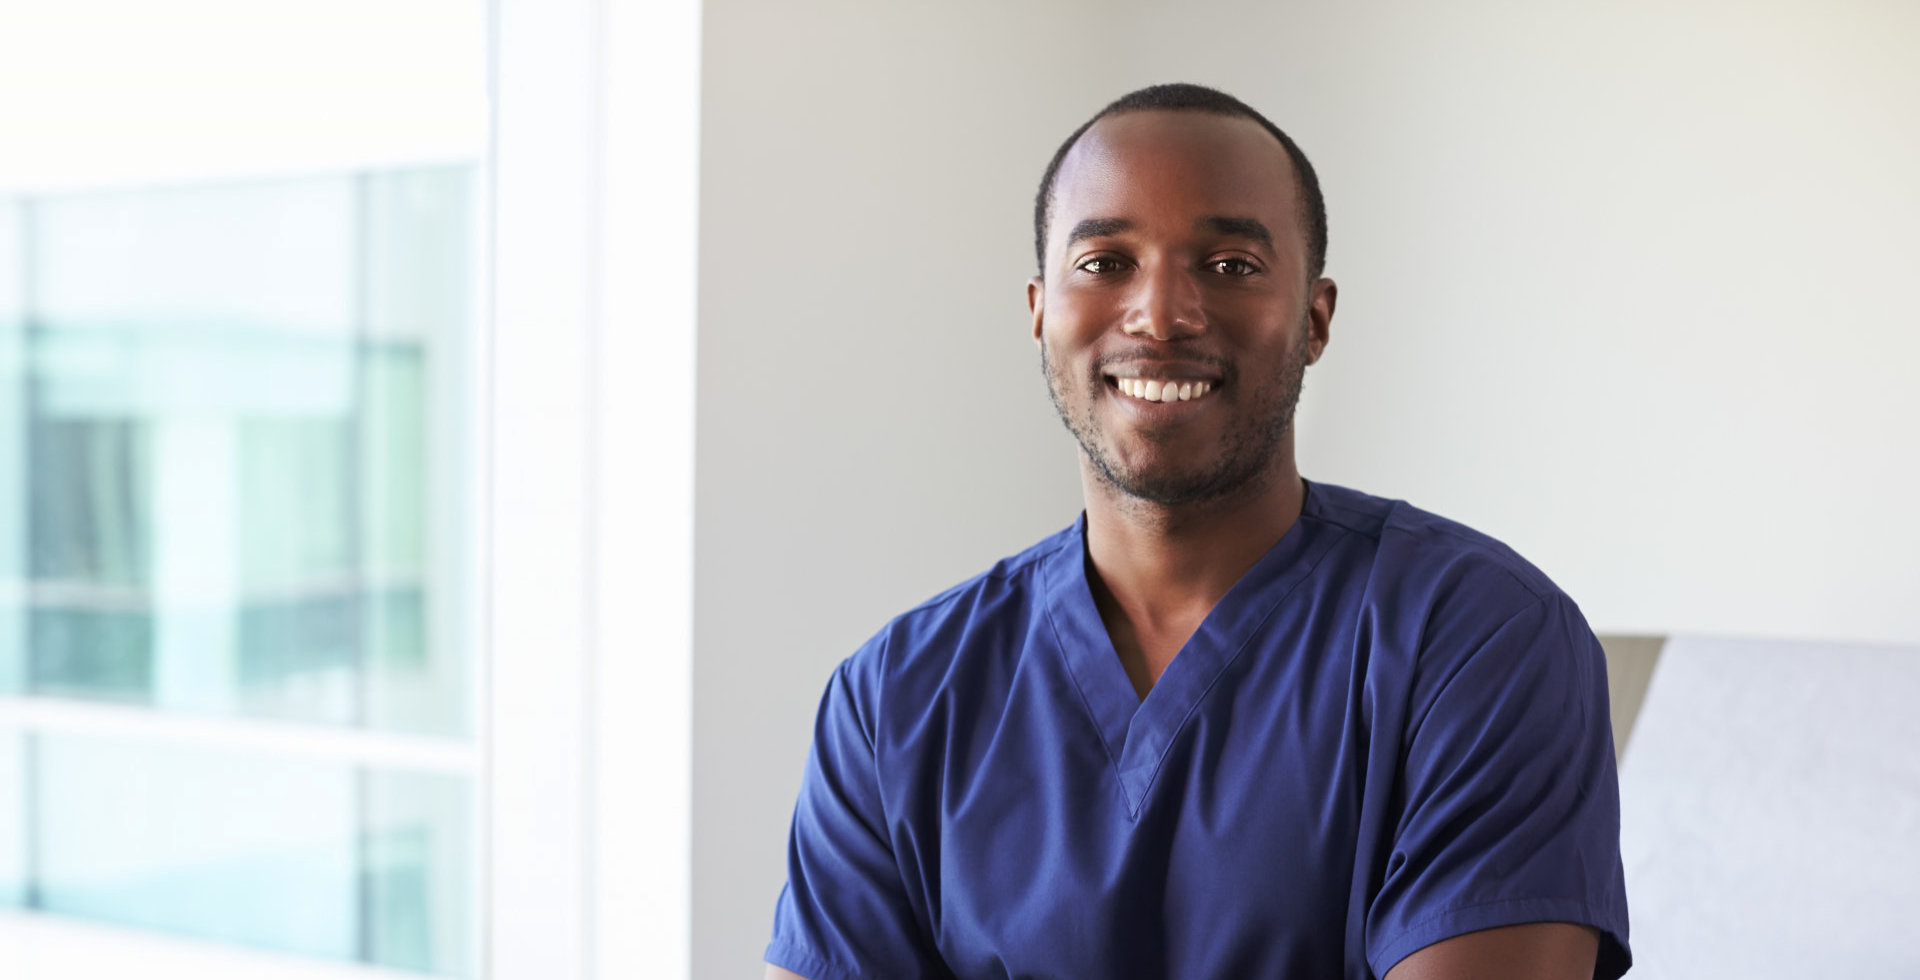 Nurse smiling at the camera